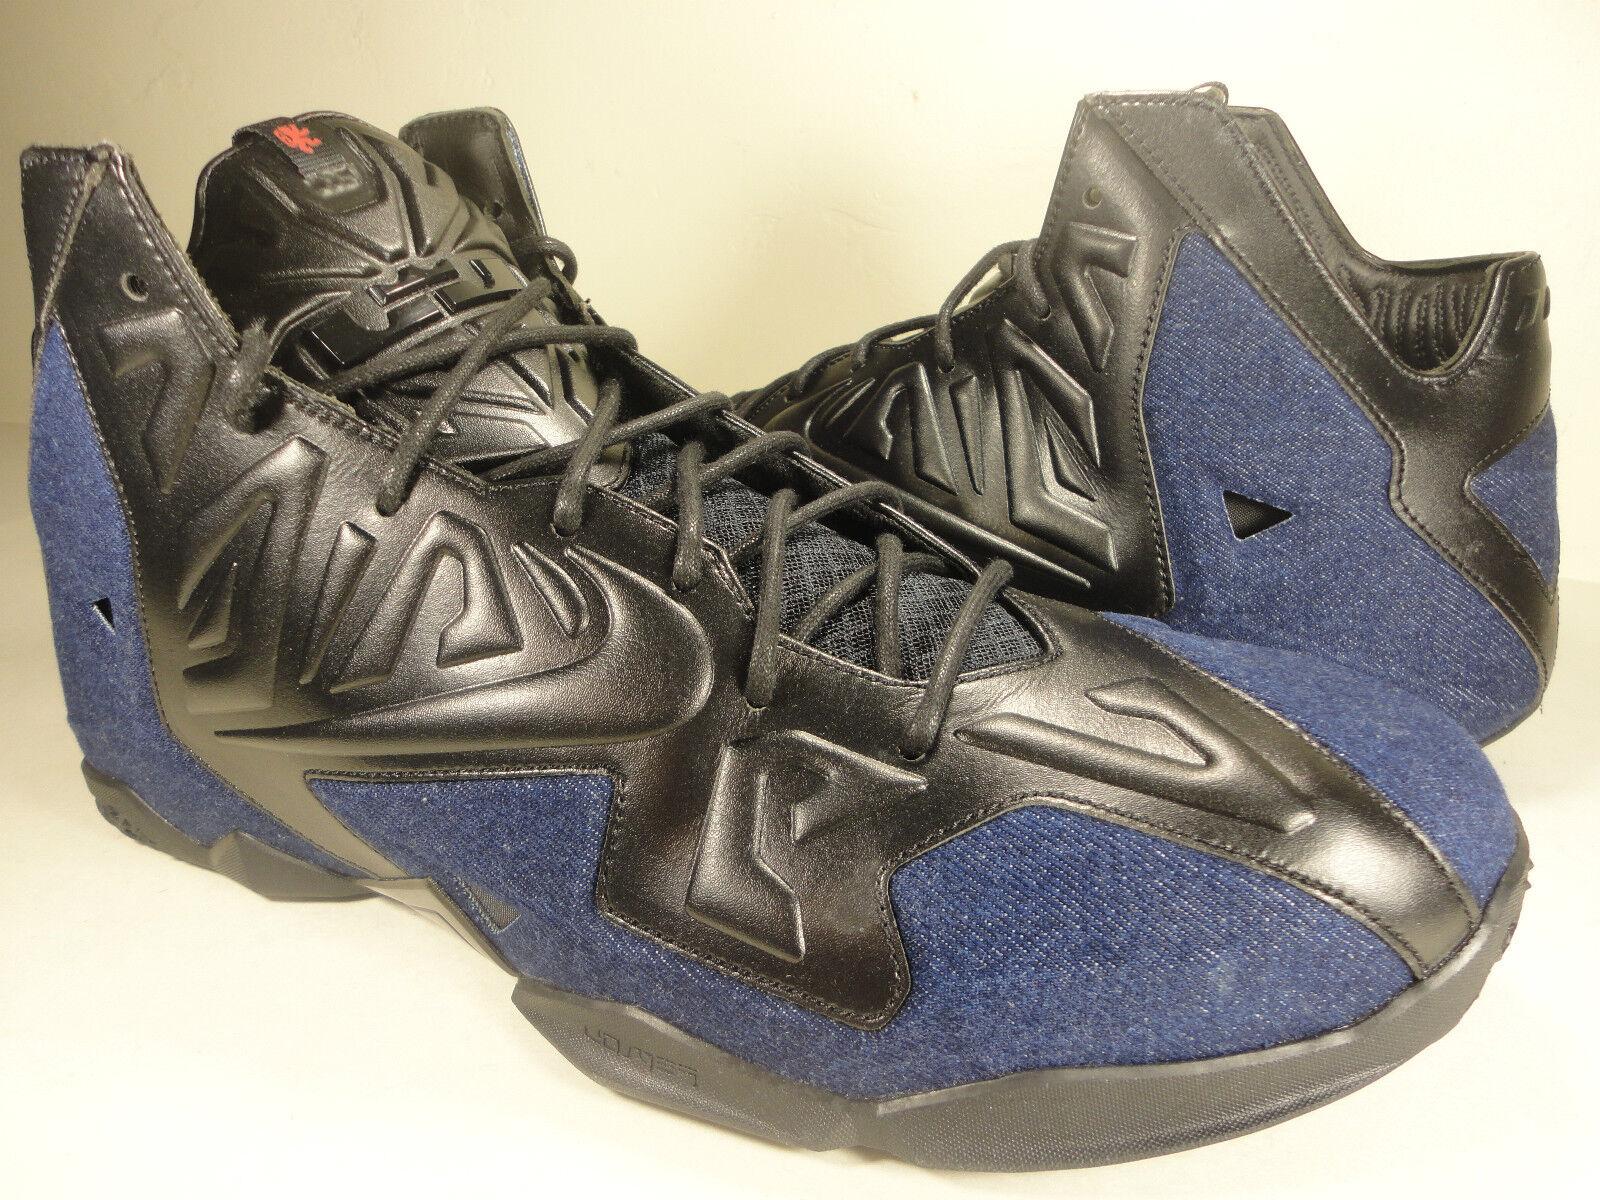 Nike Lebron XI 11 EXT Denim QS Black bluee Denim SZ 8.5   Womens 10 (659509-004)